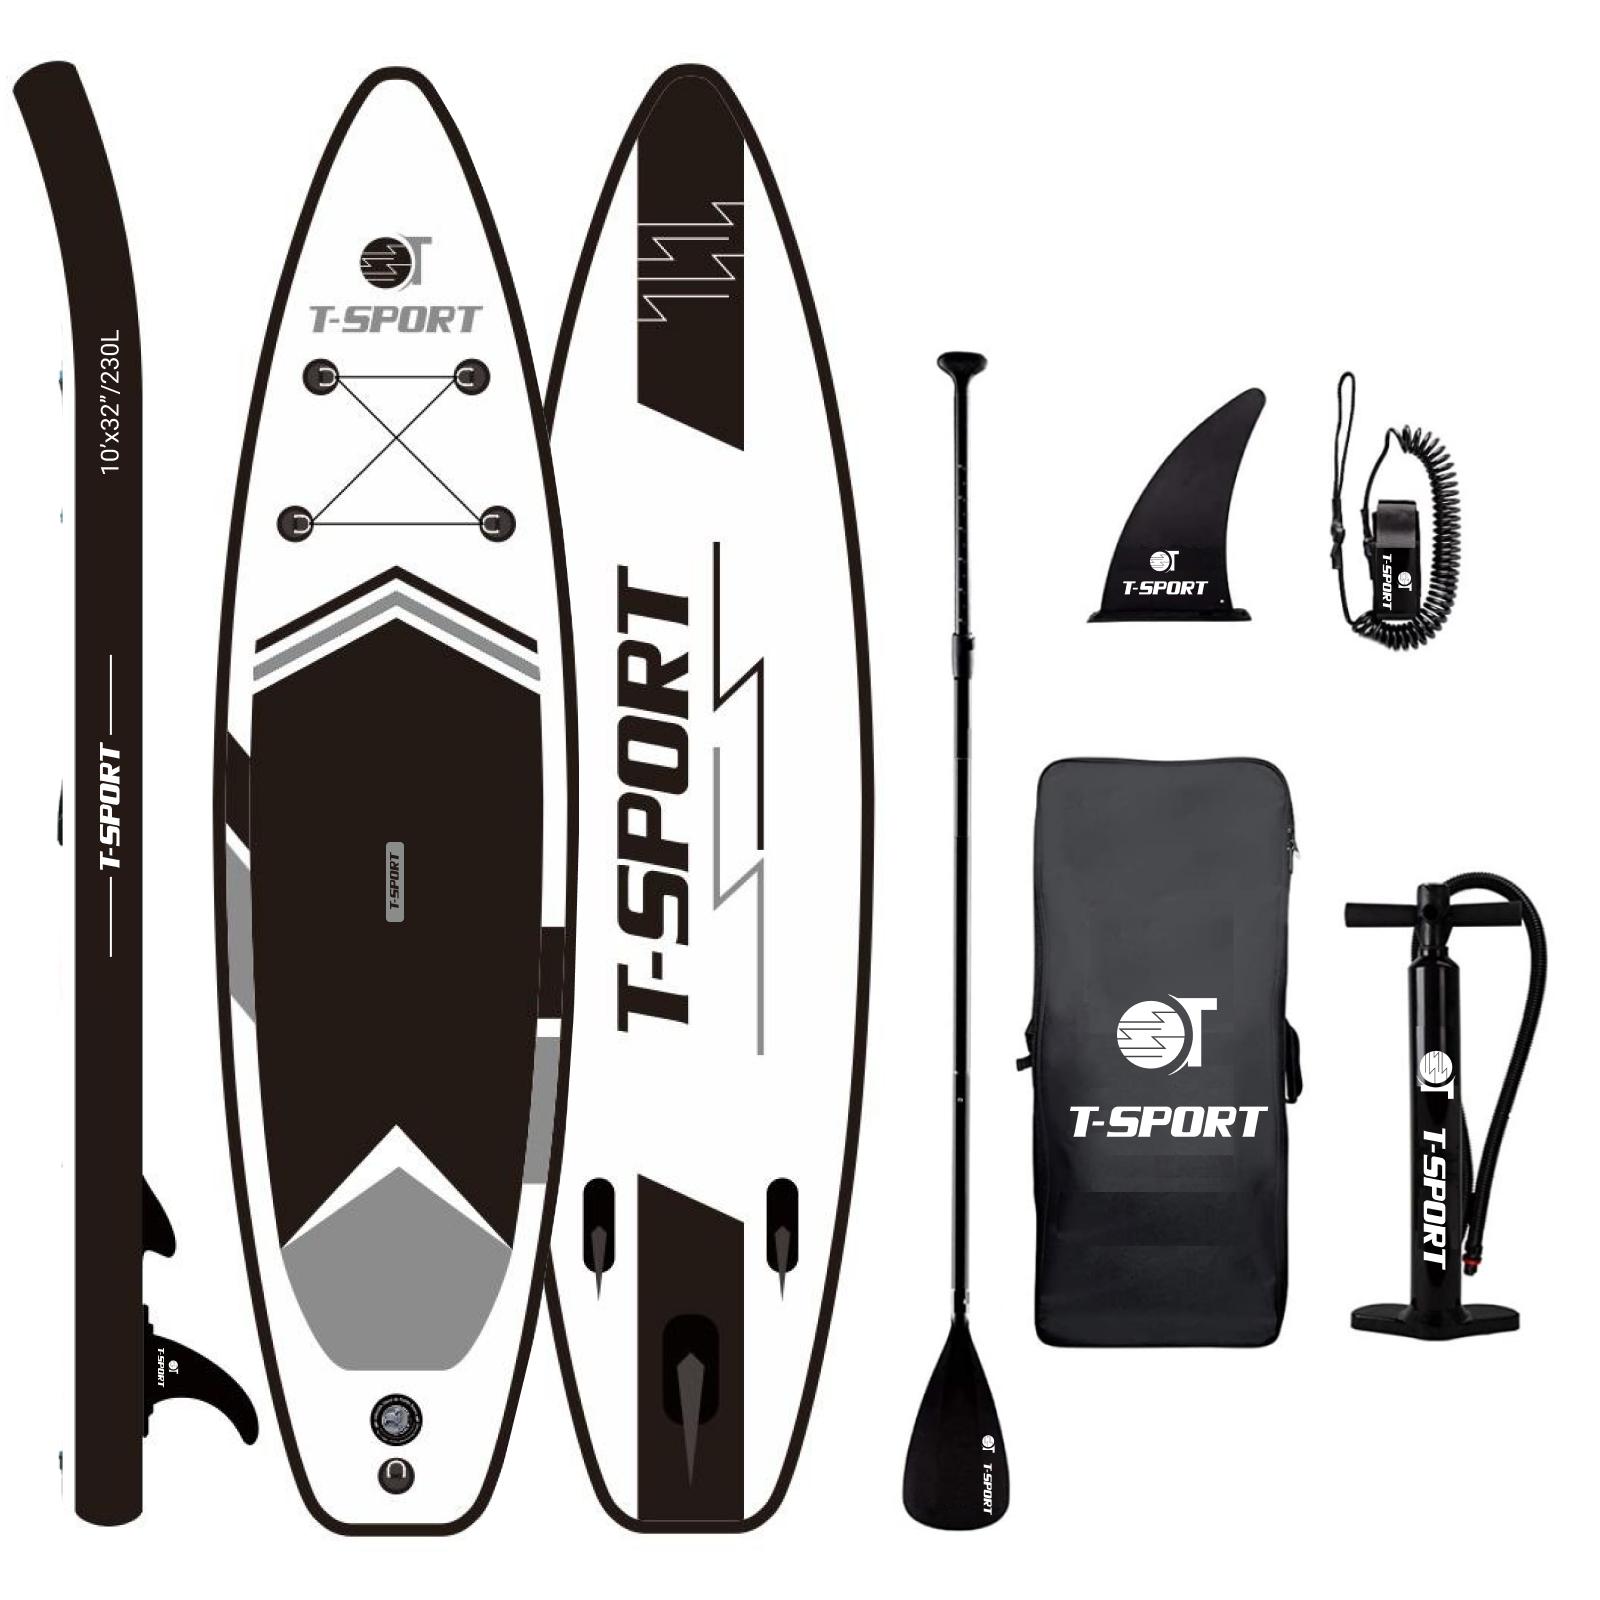 t-sport paddle board black